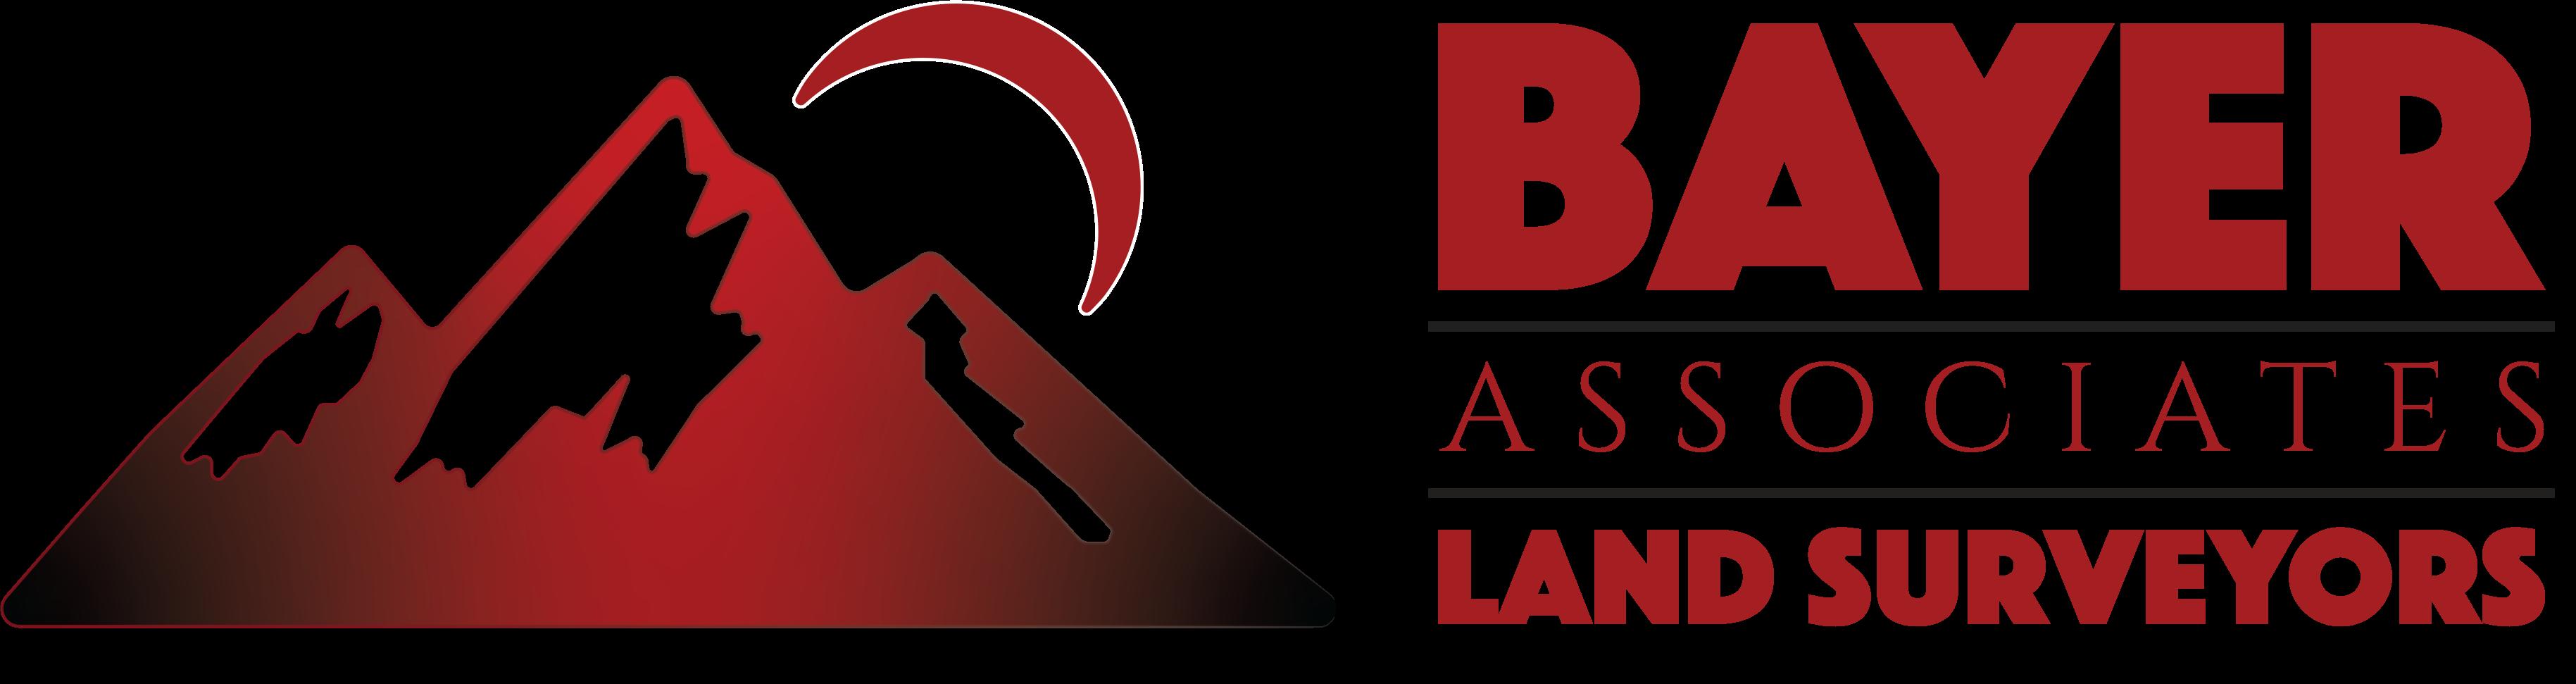 Bayer Associates